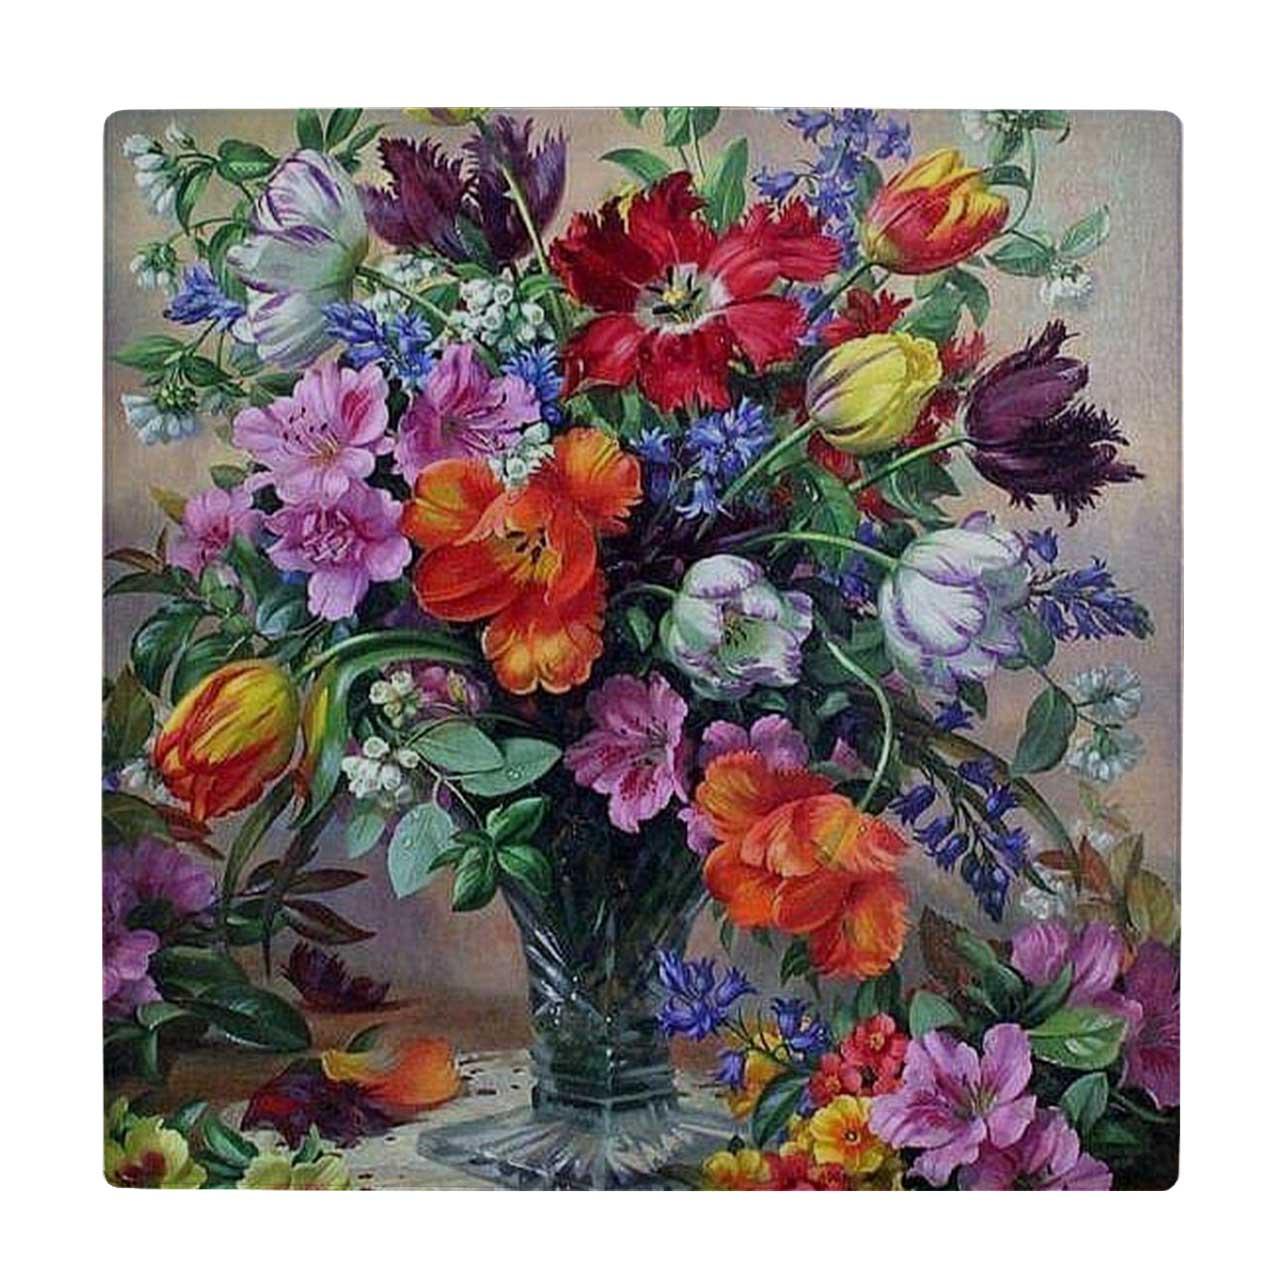 خرید                                         کاشی طرح گلدان گل کد wk3424